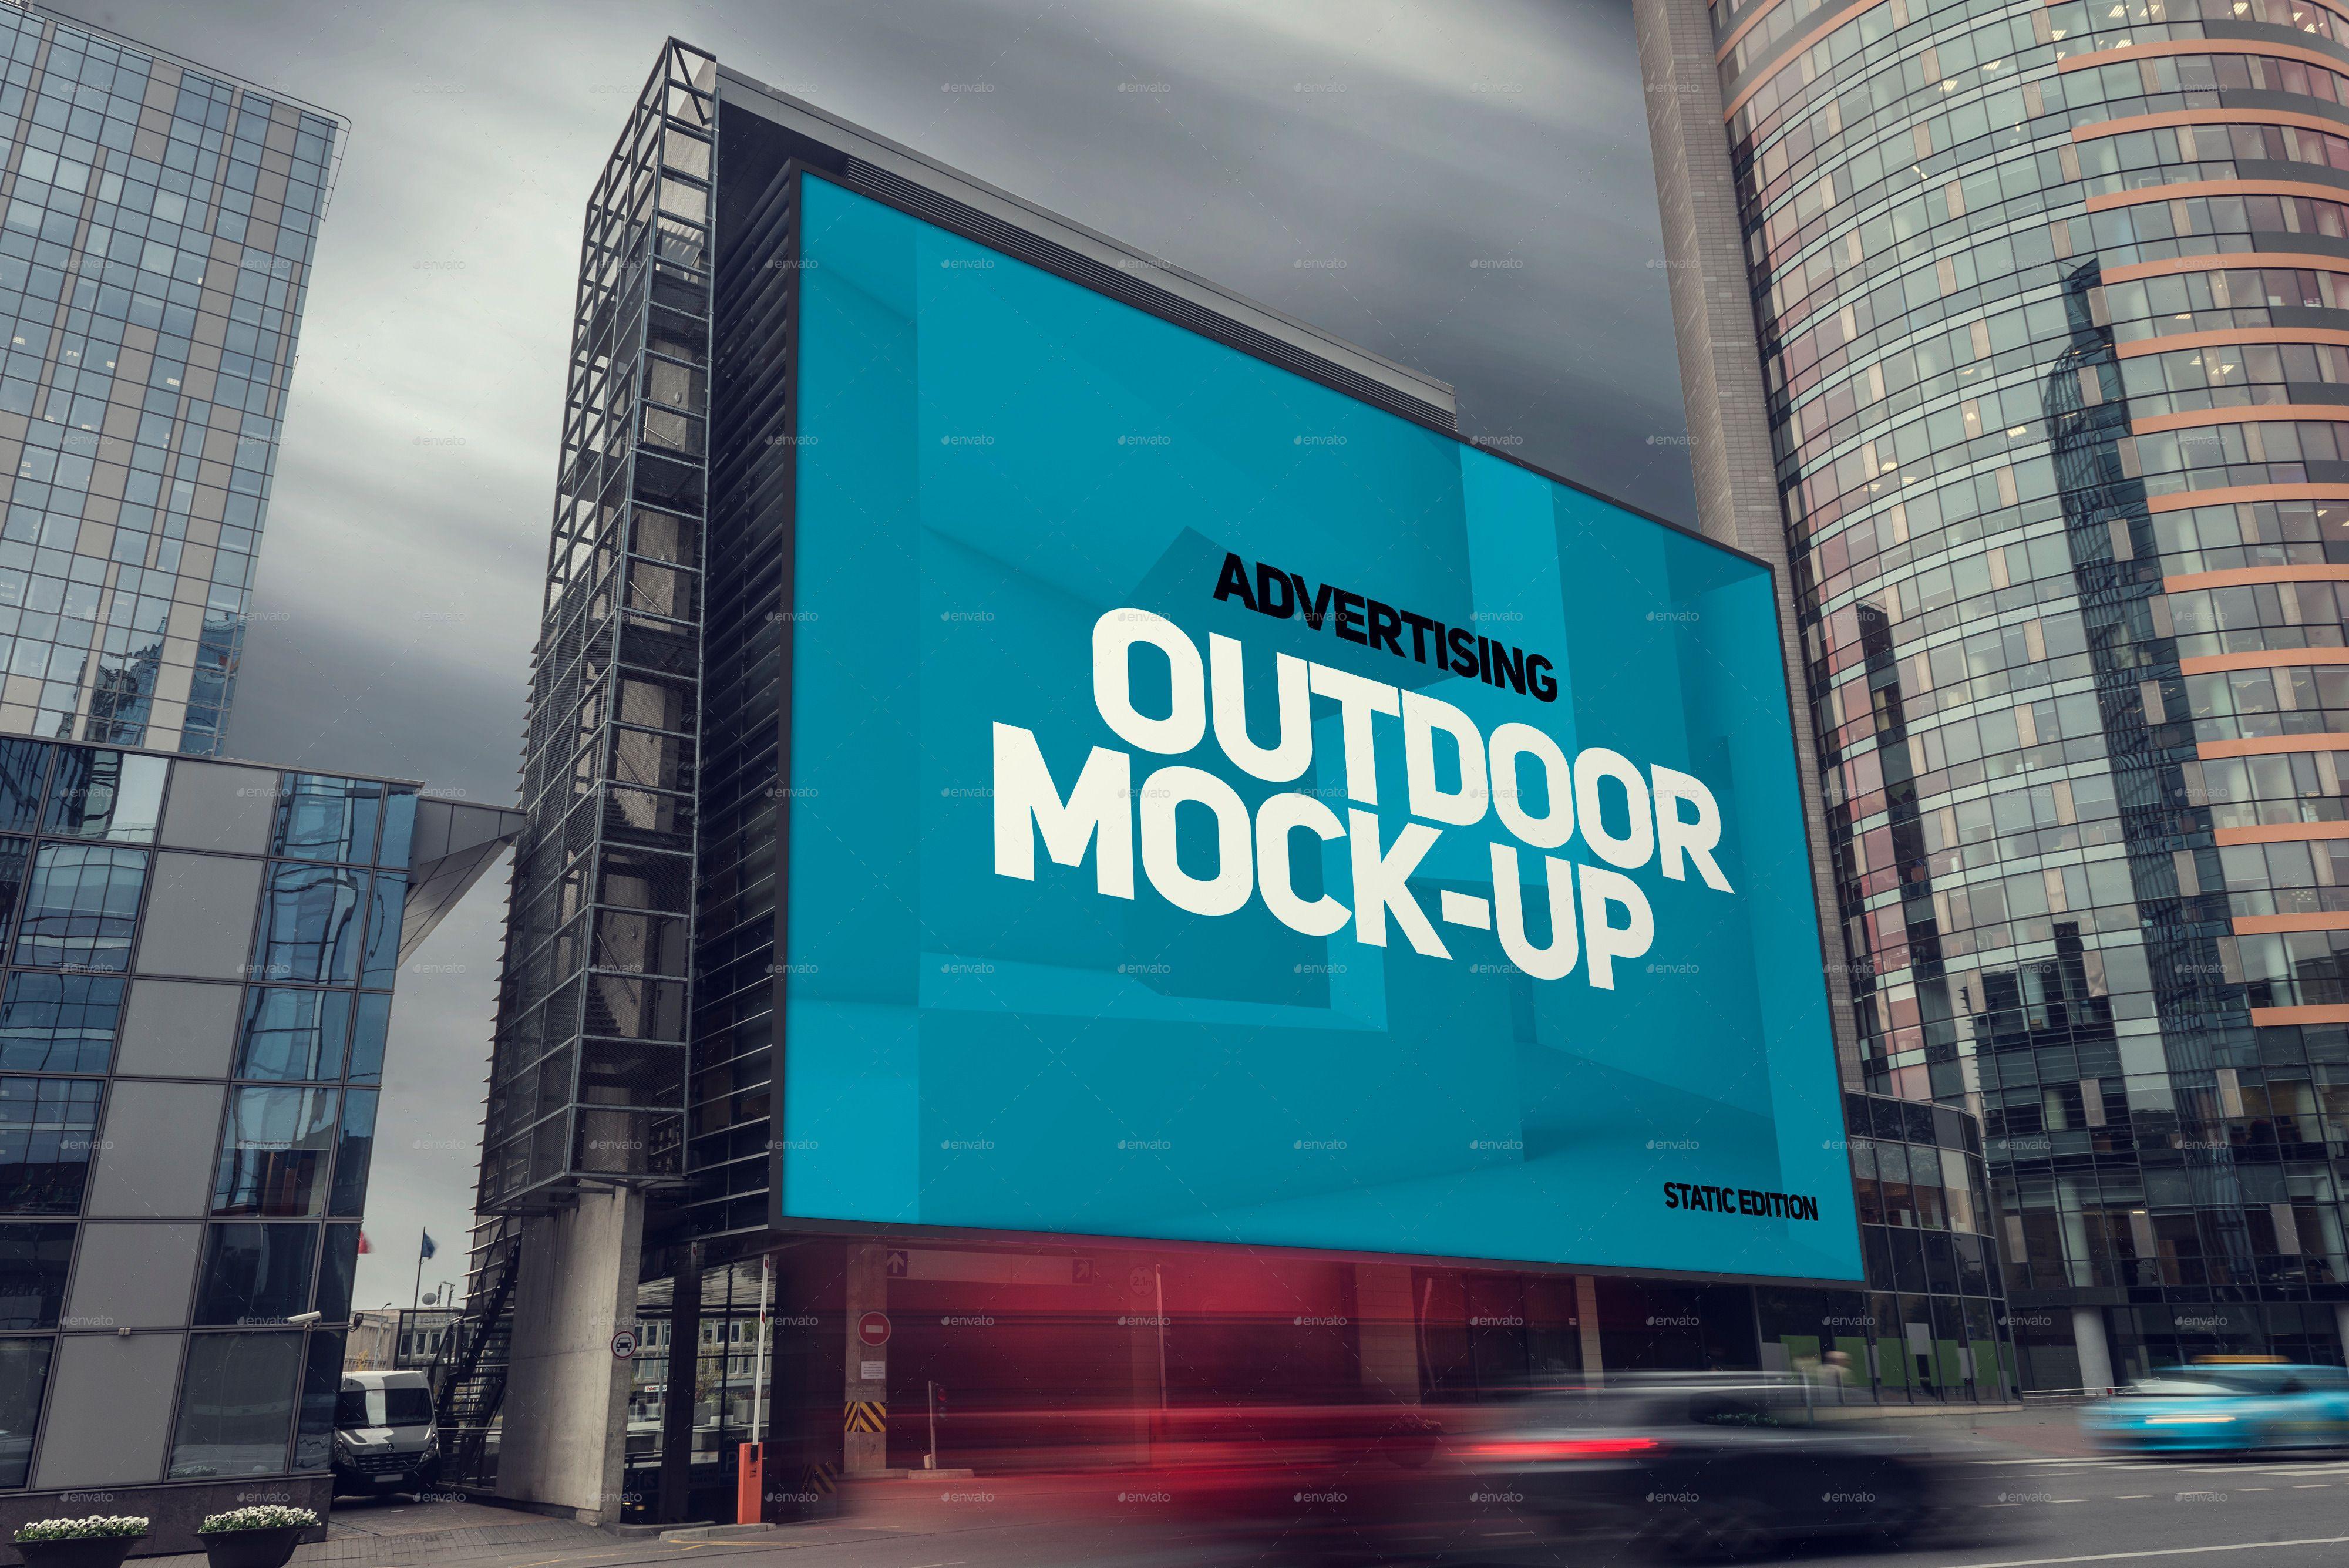 Animated Outdoor Advertising Mock-ups | Mockup